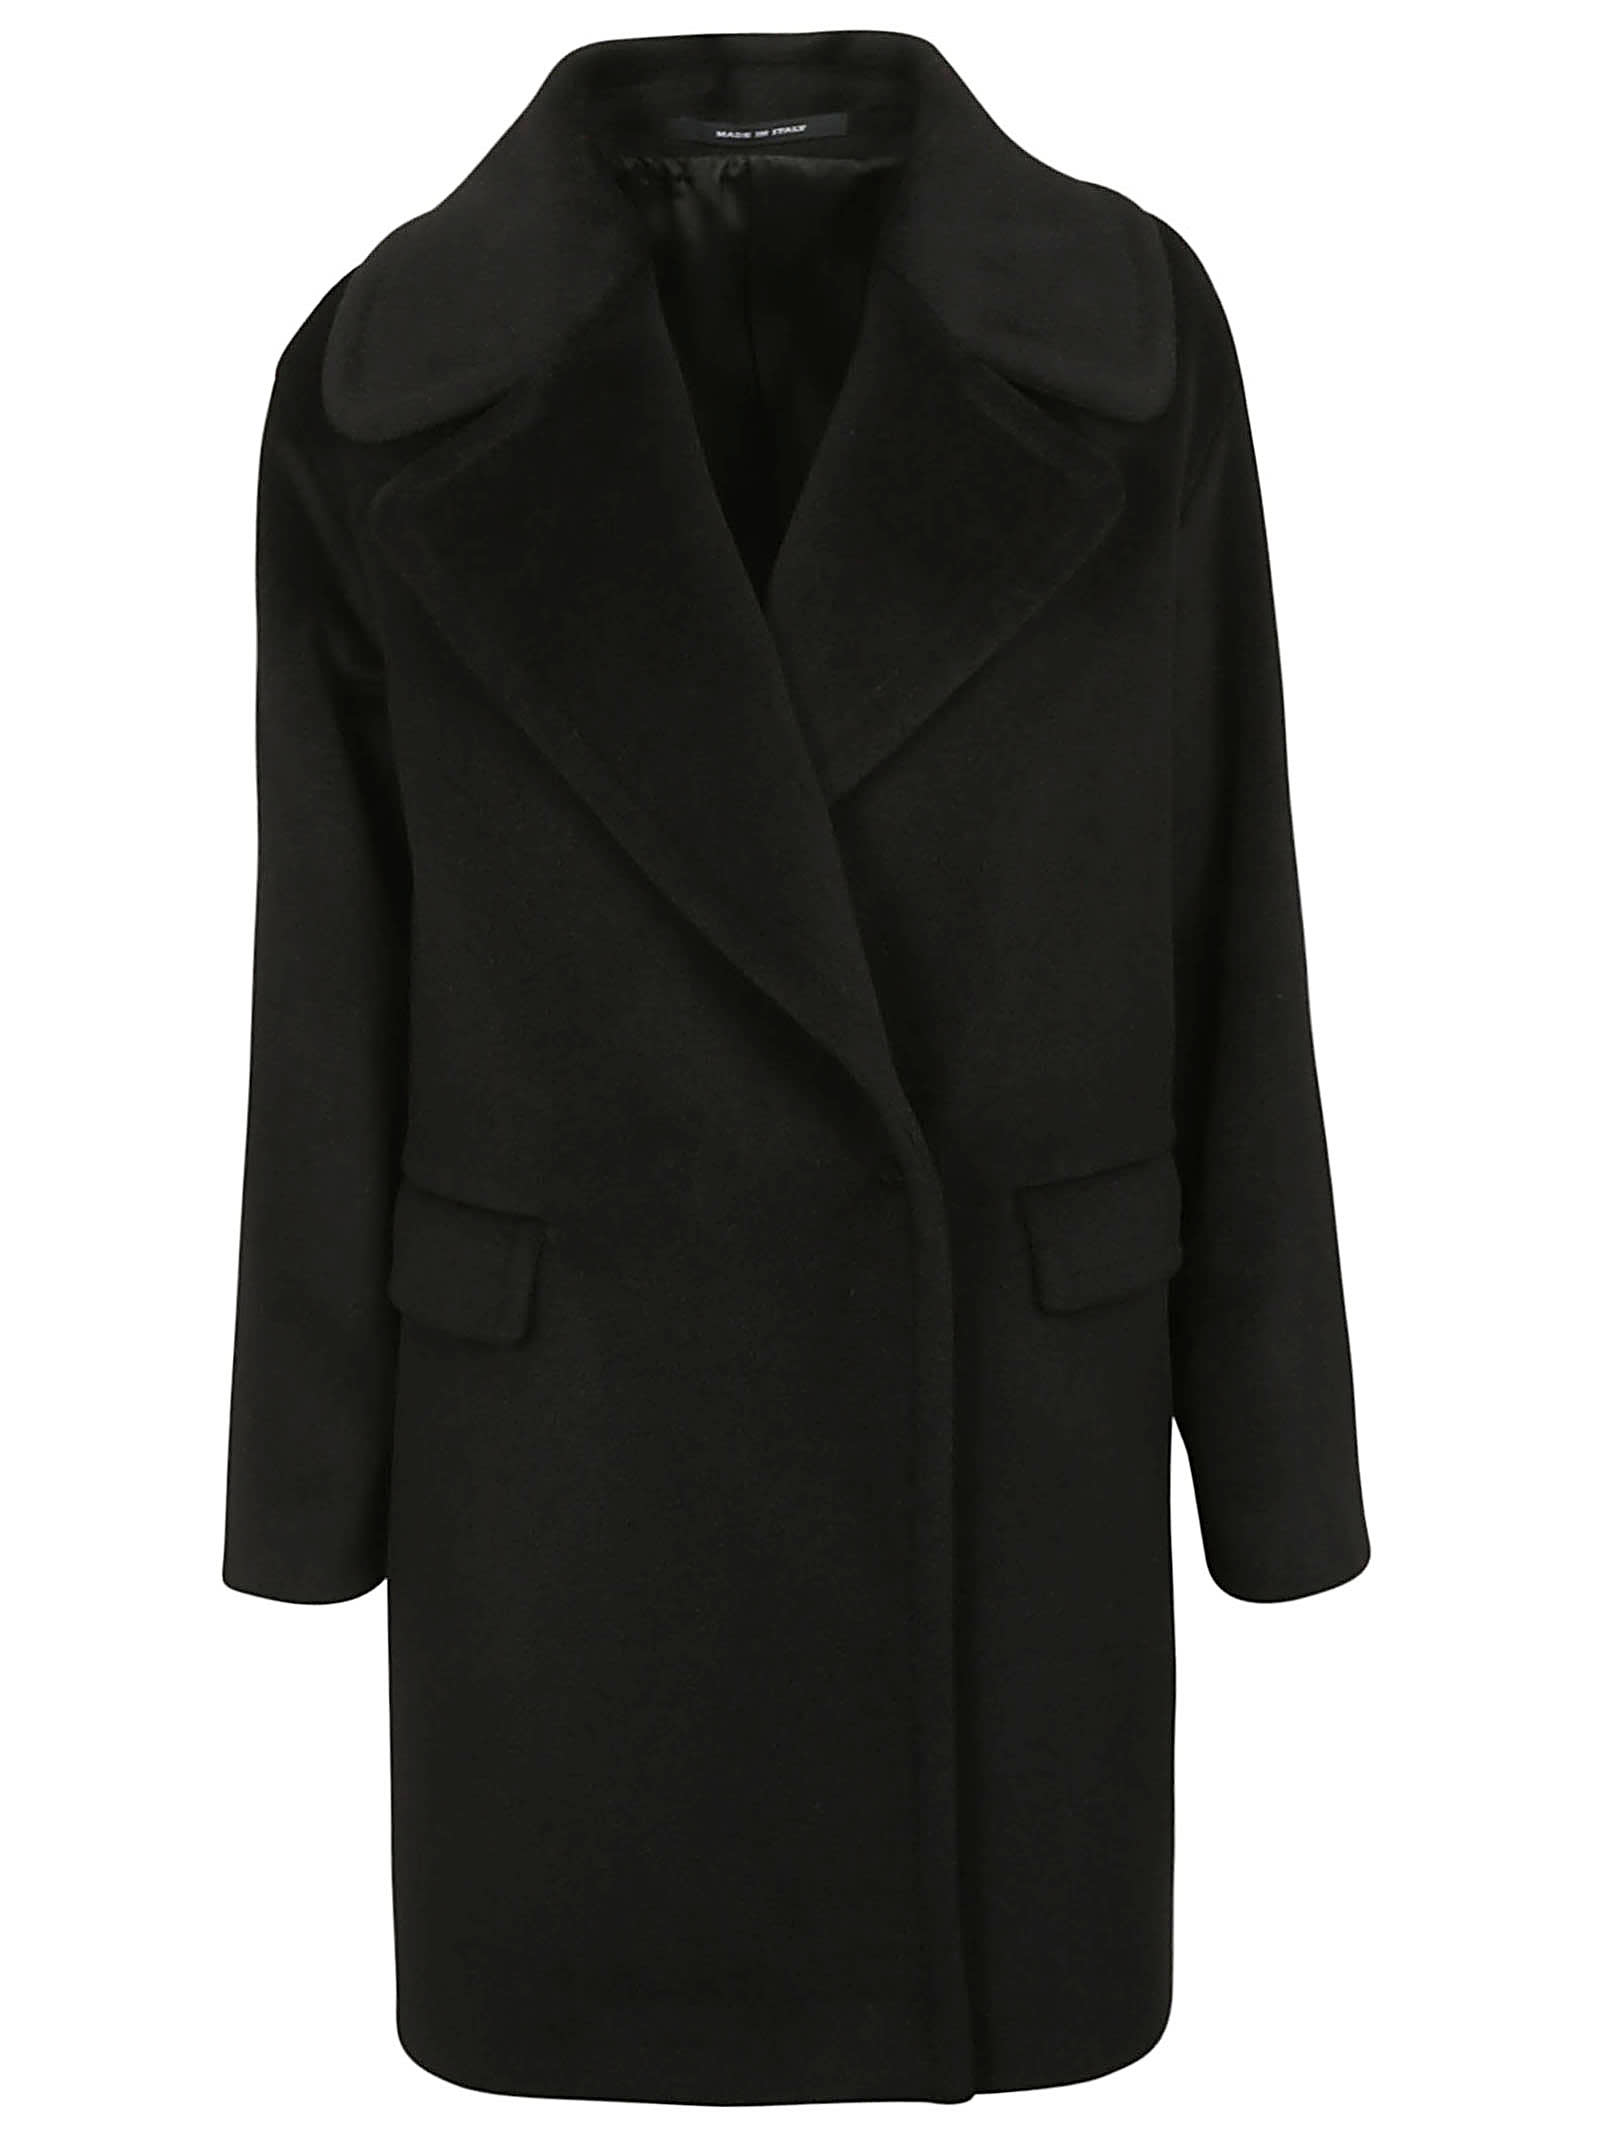 Photo of  Tagliatore Wide Lapel Coat- shop Tagliatore jackets online sales